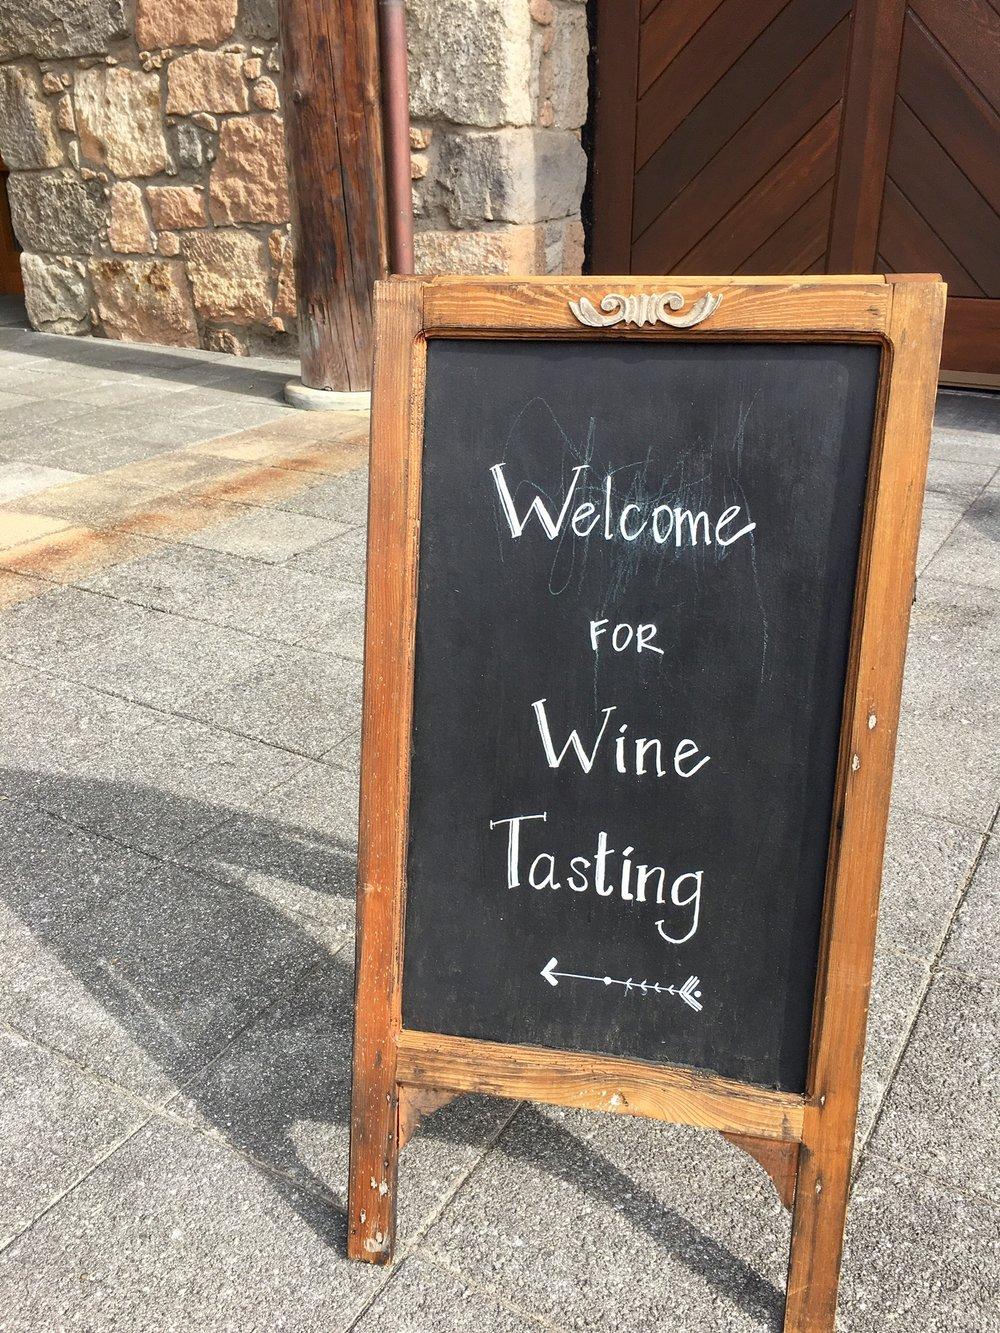 Wine tasting galore